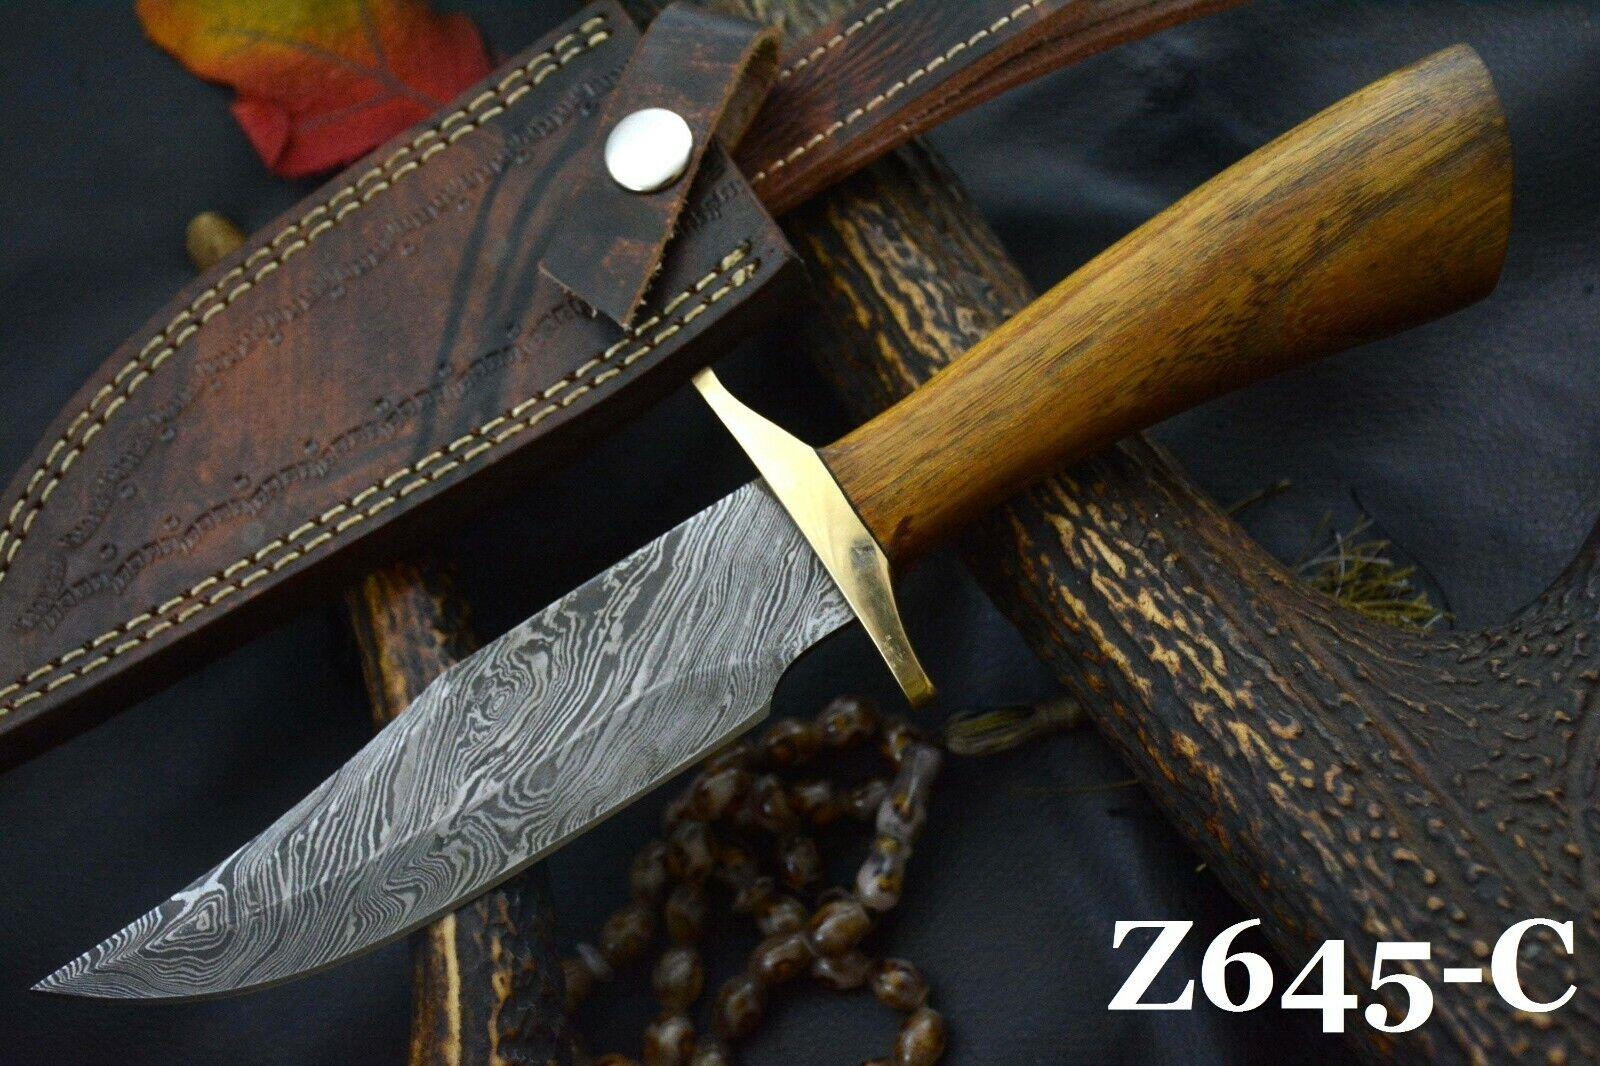 Custom Damascus Steel Hunting Knife Handmade With Walnut Handle Z645-C  - $19.99